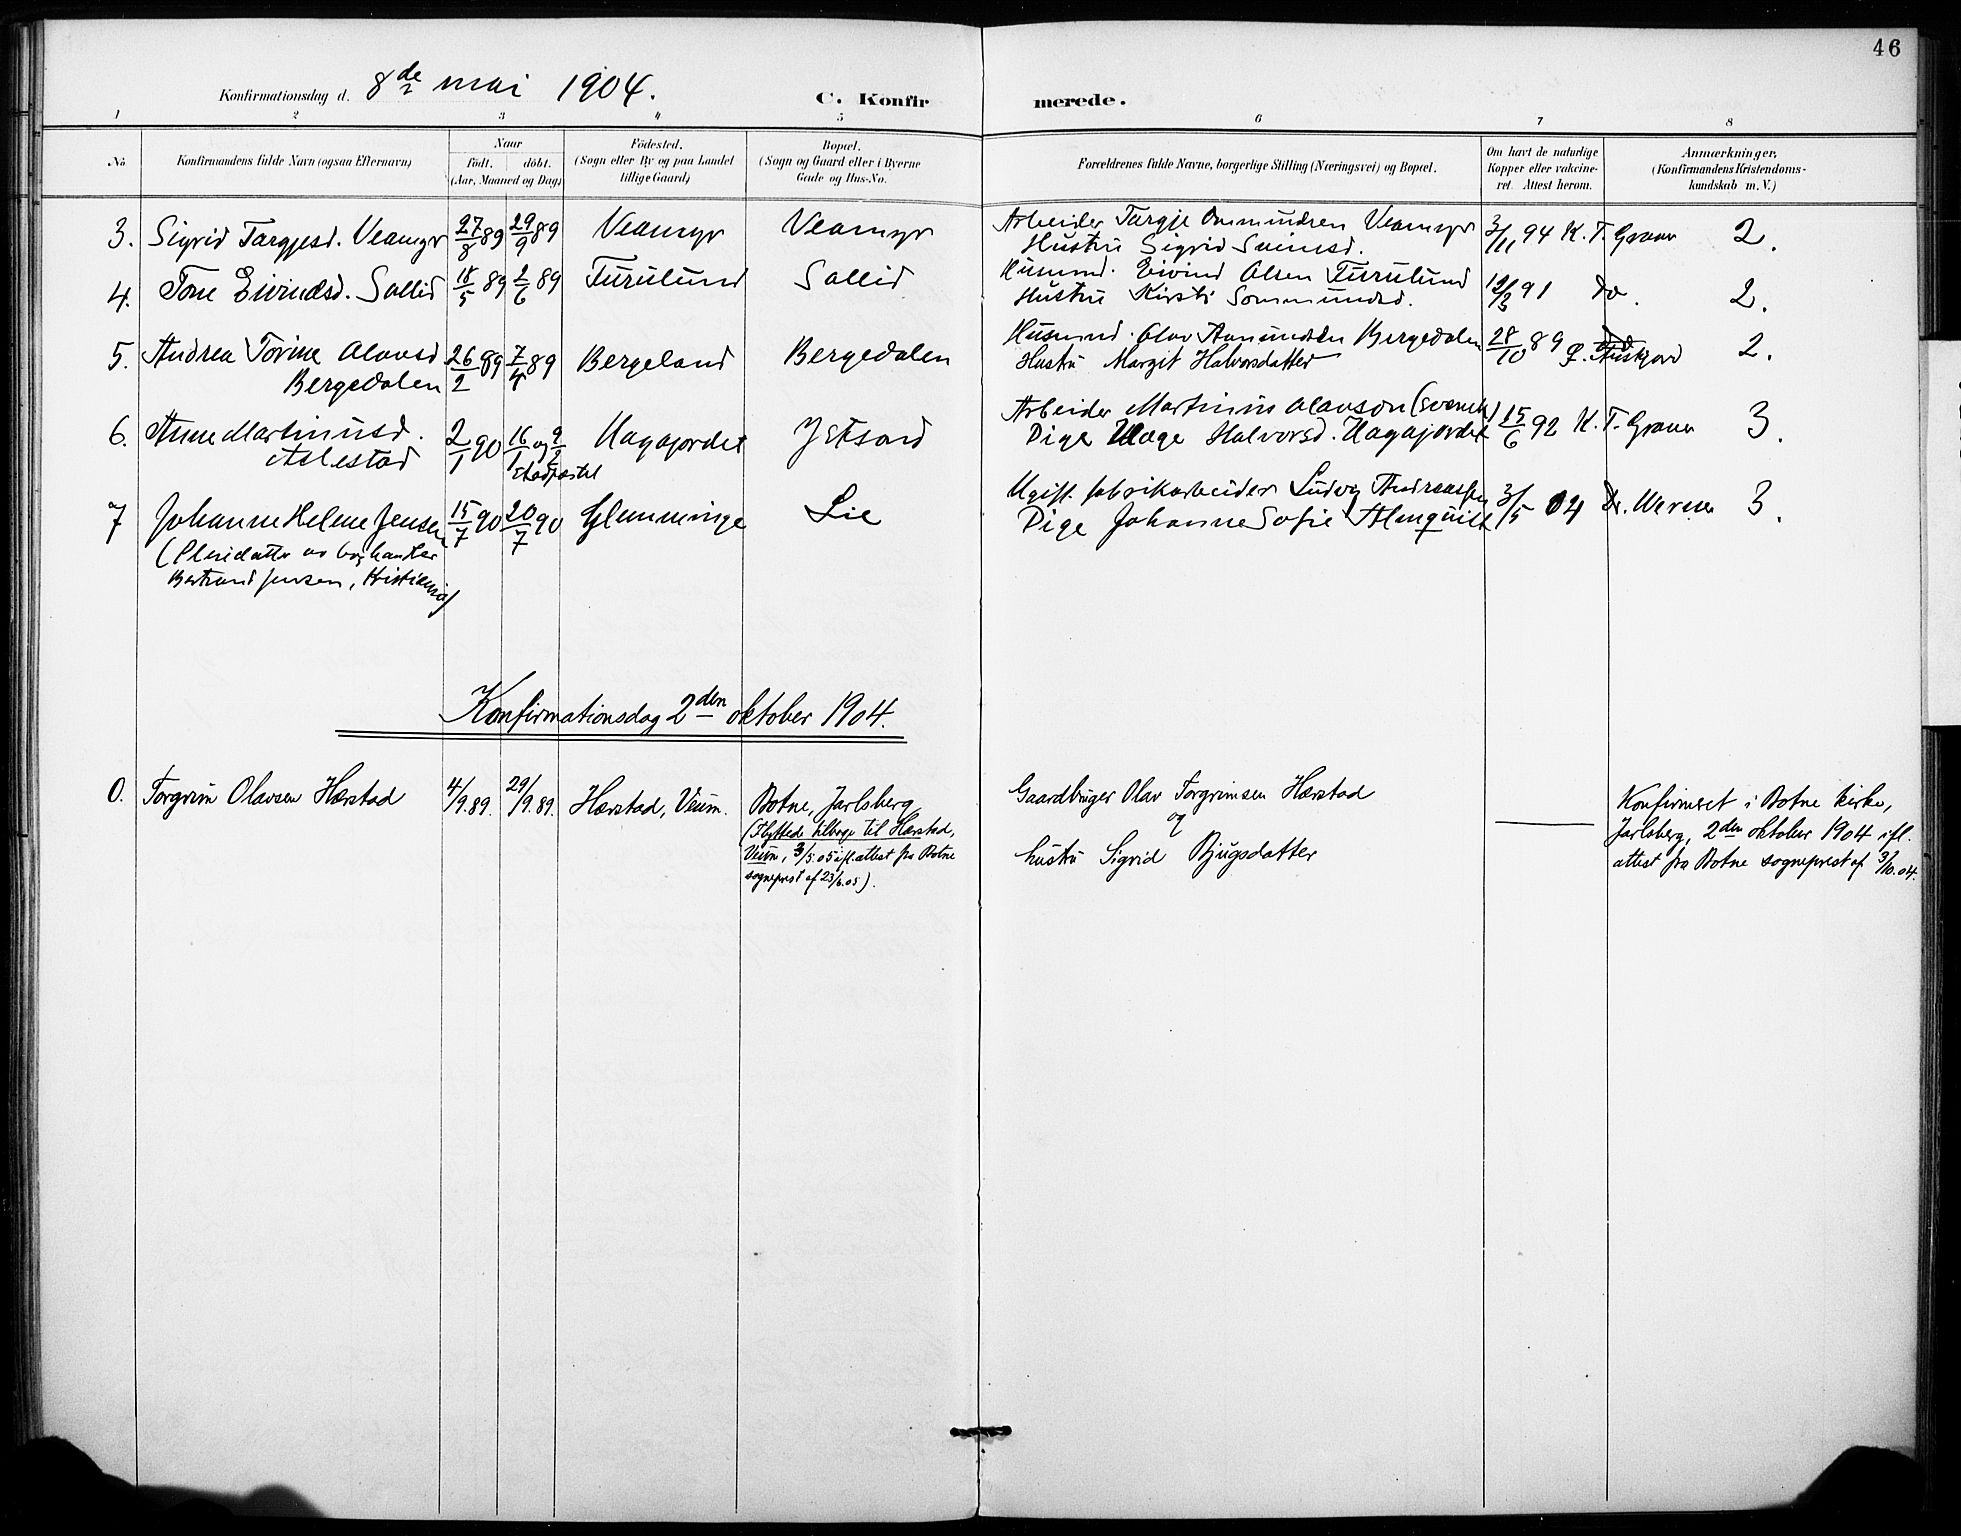 SAKO, Fyresdal kirkebøker, F/Fb/L0003: Ministerialbok nr. II 3, 1887-1903, s. 46